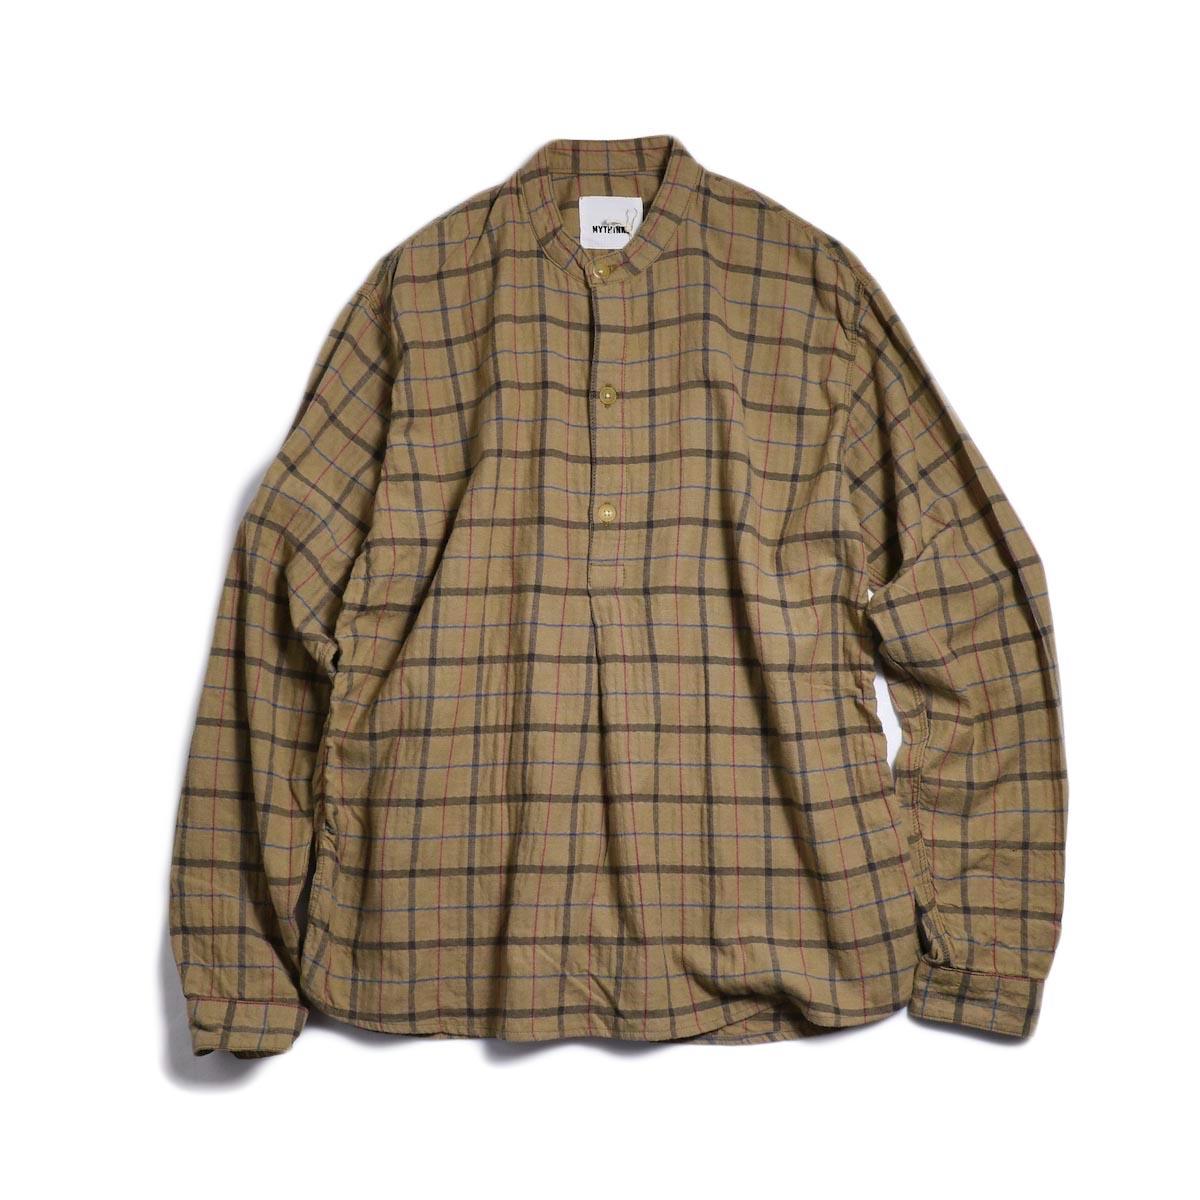 MYTHINKS (Men's) / MY Check Stand Collar Shirt -Beige